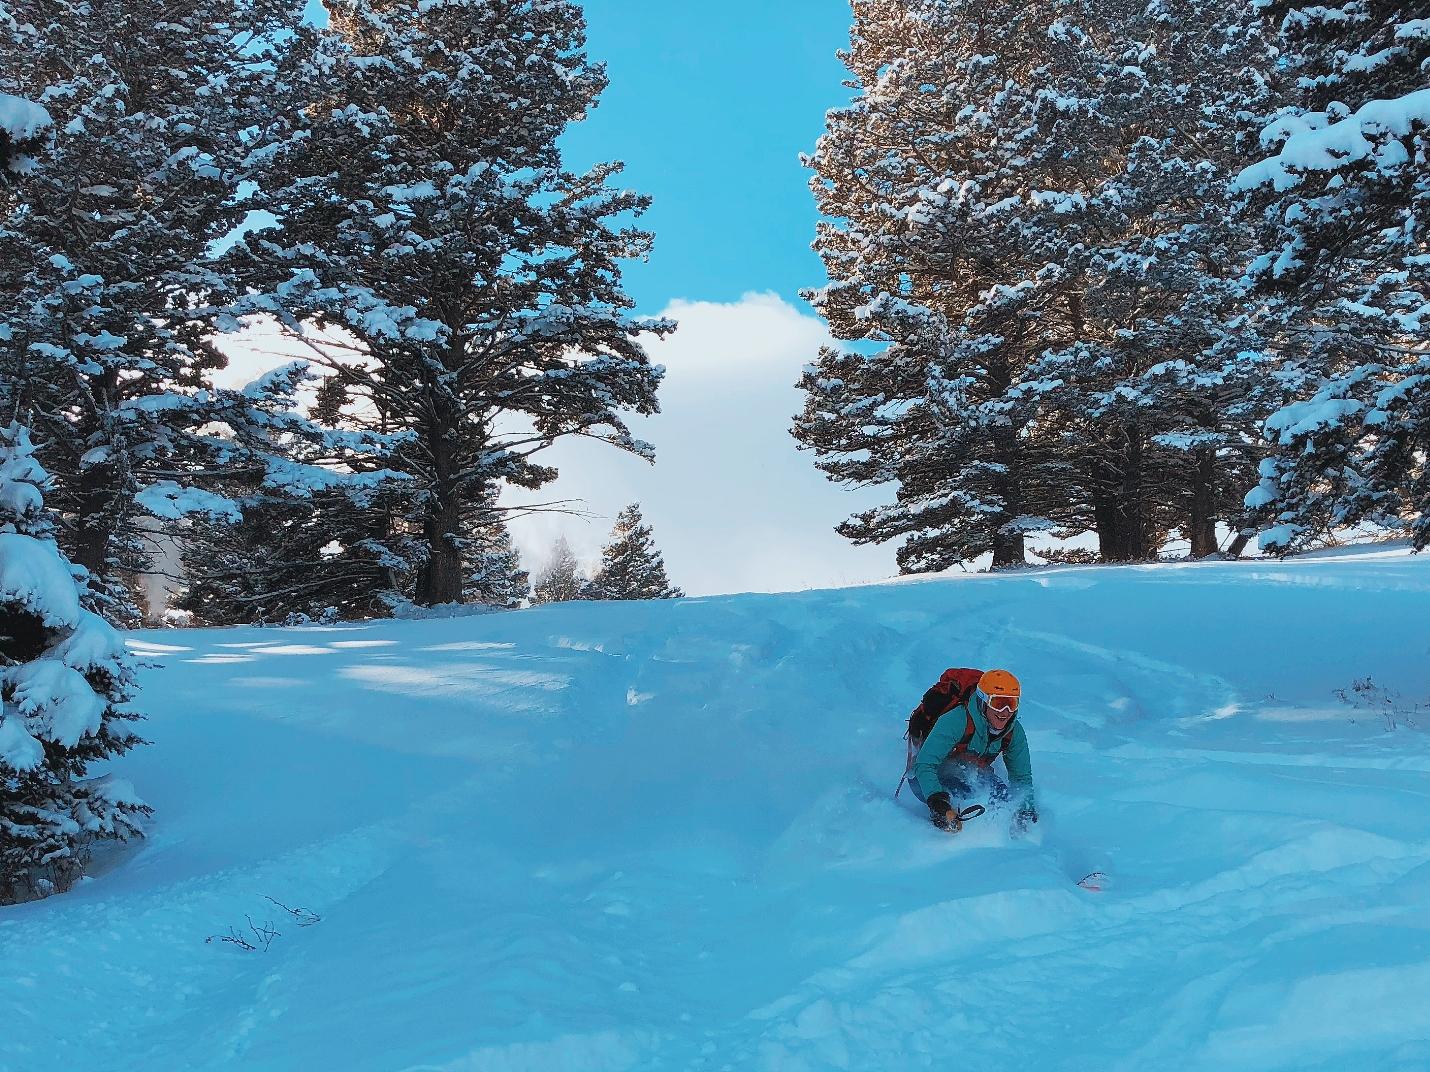 headwall-digital-skiing-bridger-bowl-outdoor-copywriting